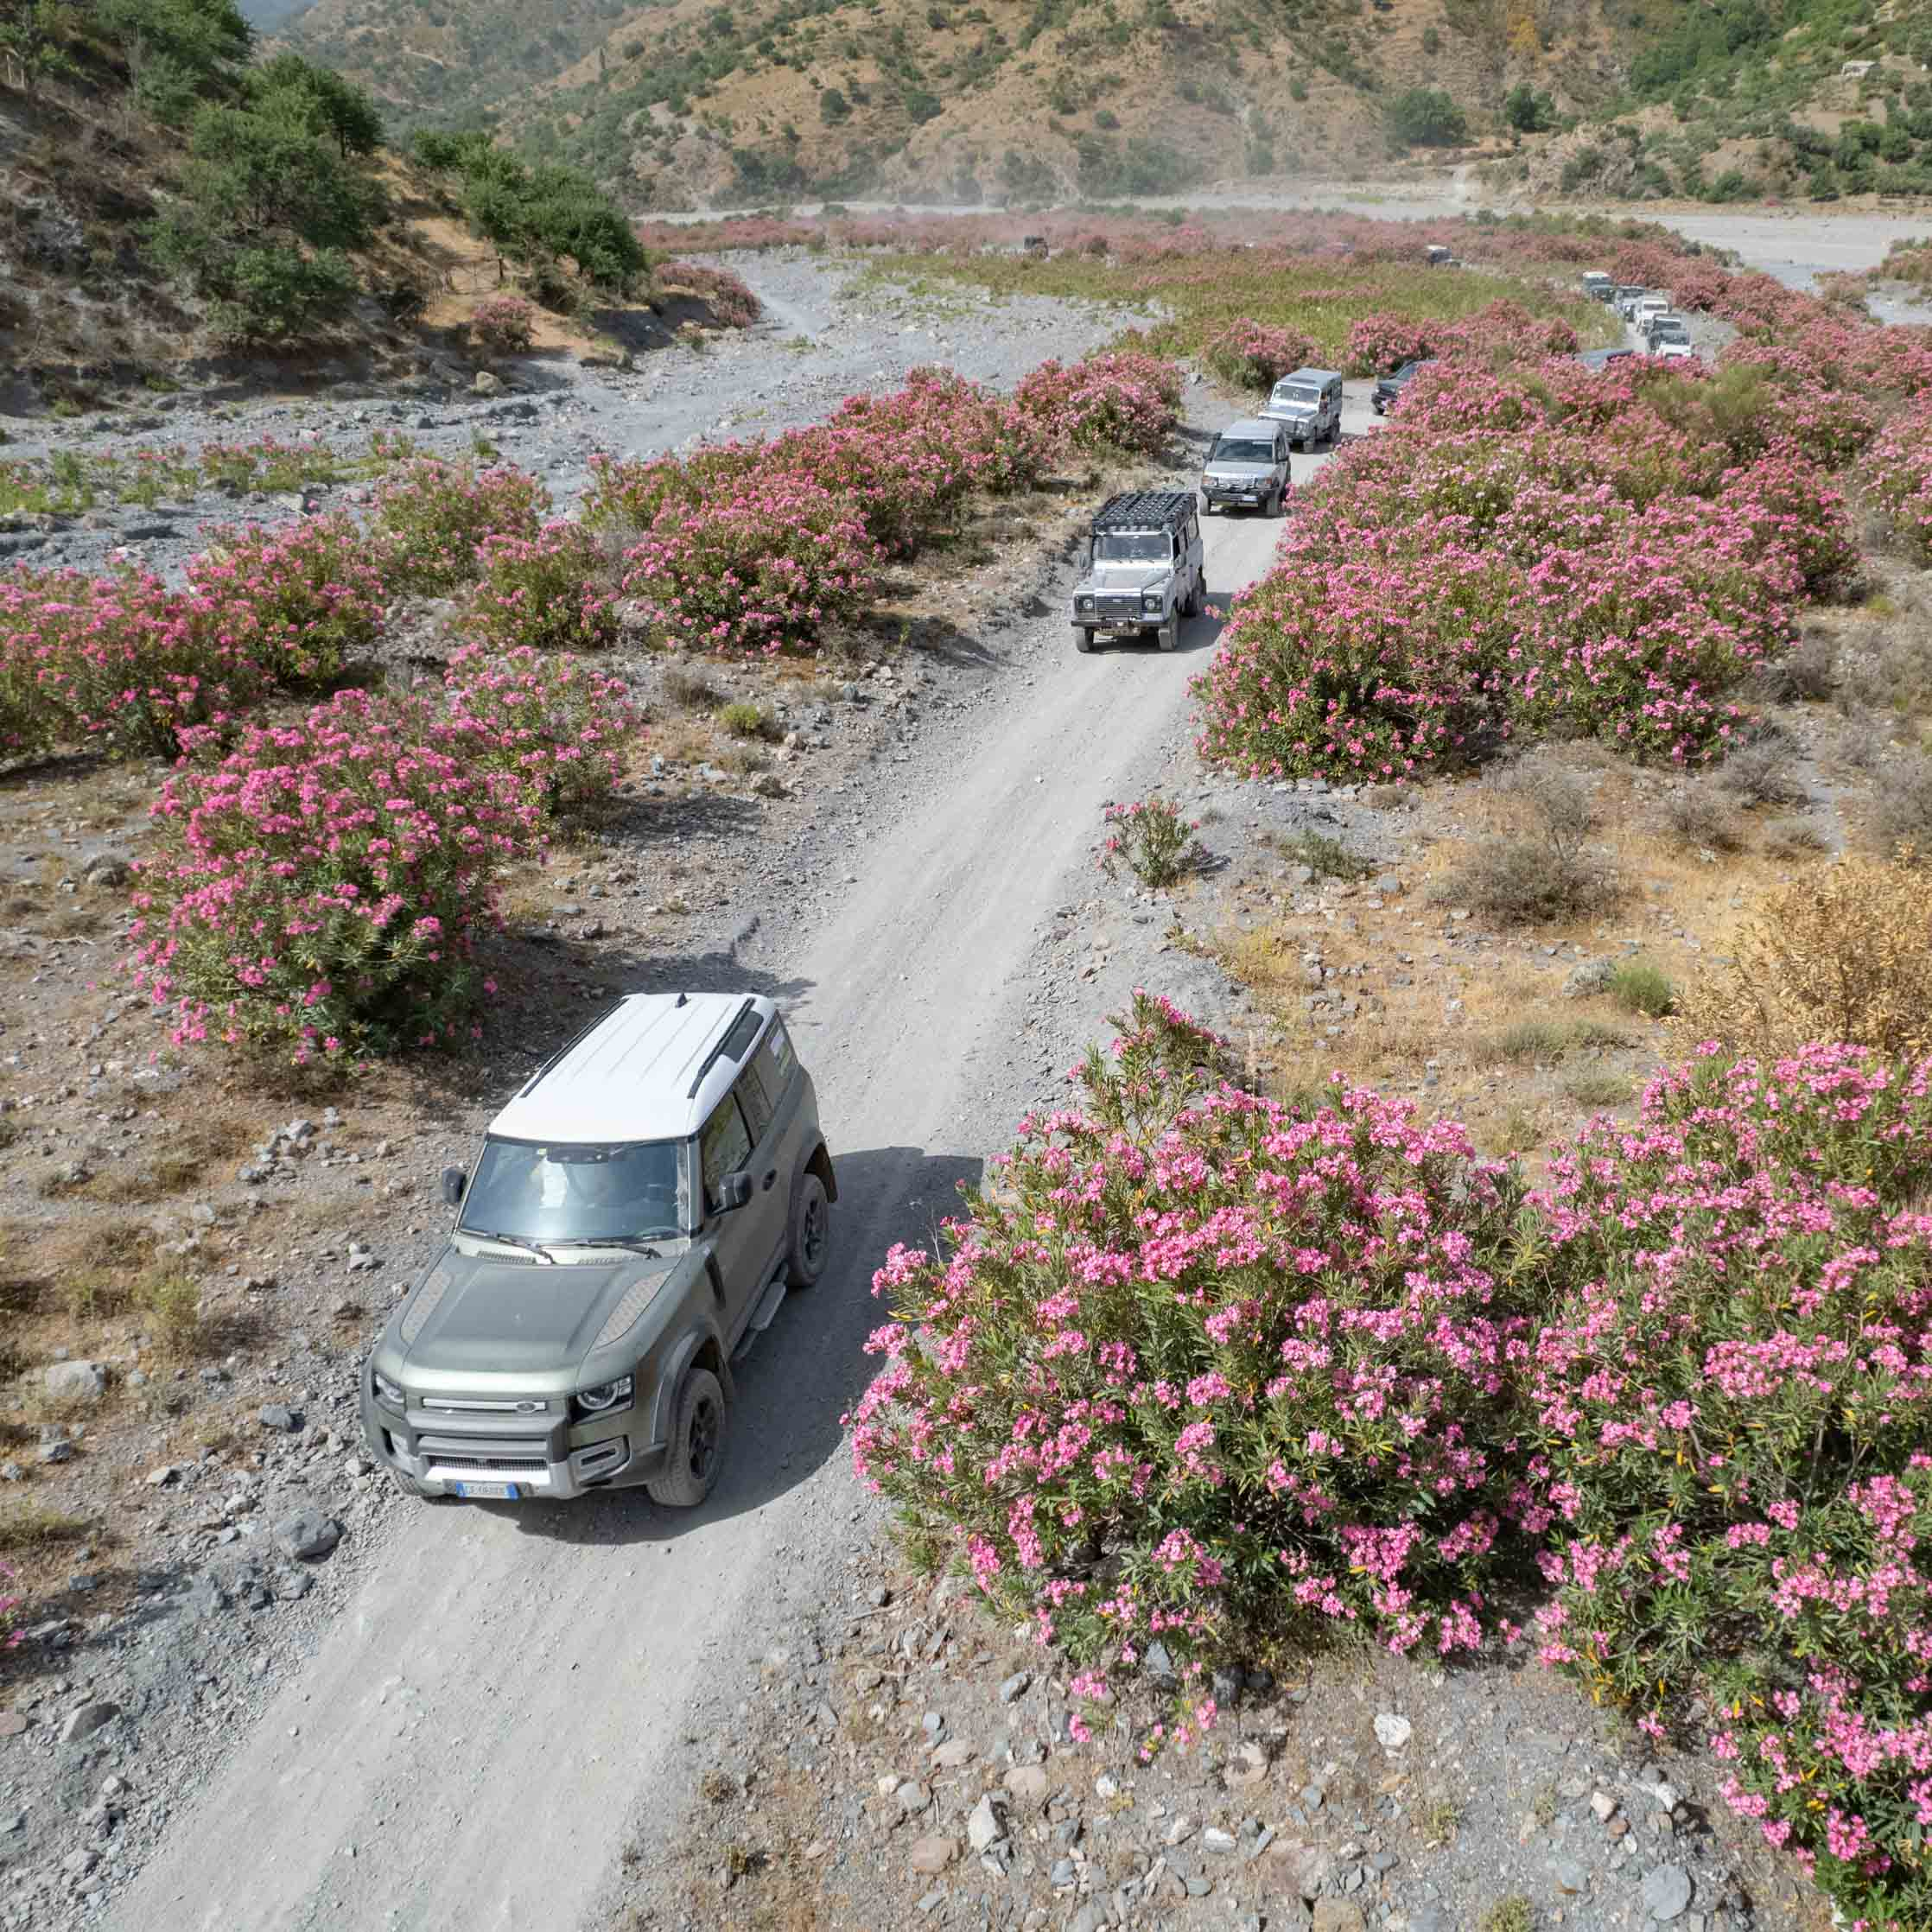 Land_Rover_Tour_Sicilia_2021_Land_Rover_Experience_Italia_-9